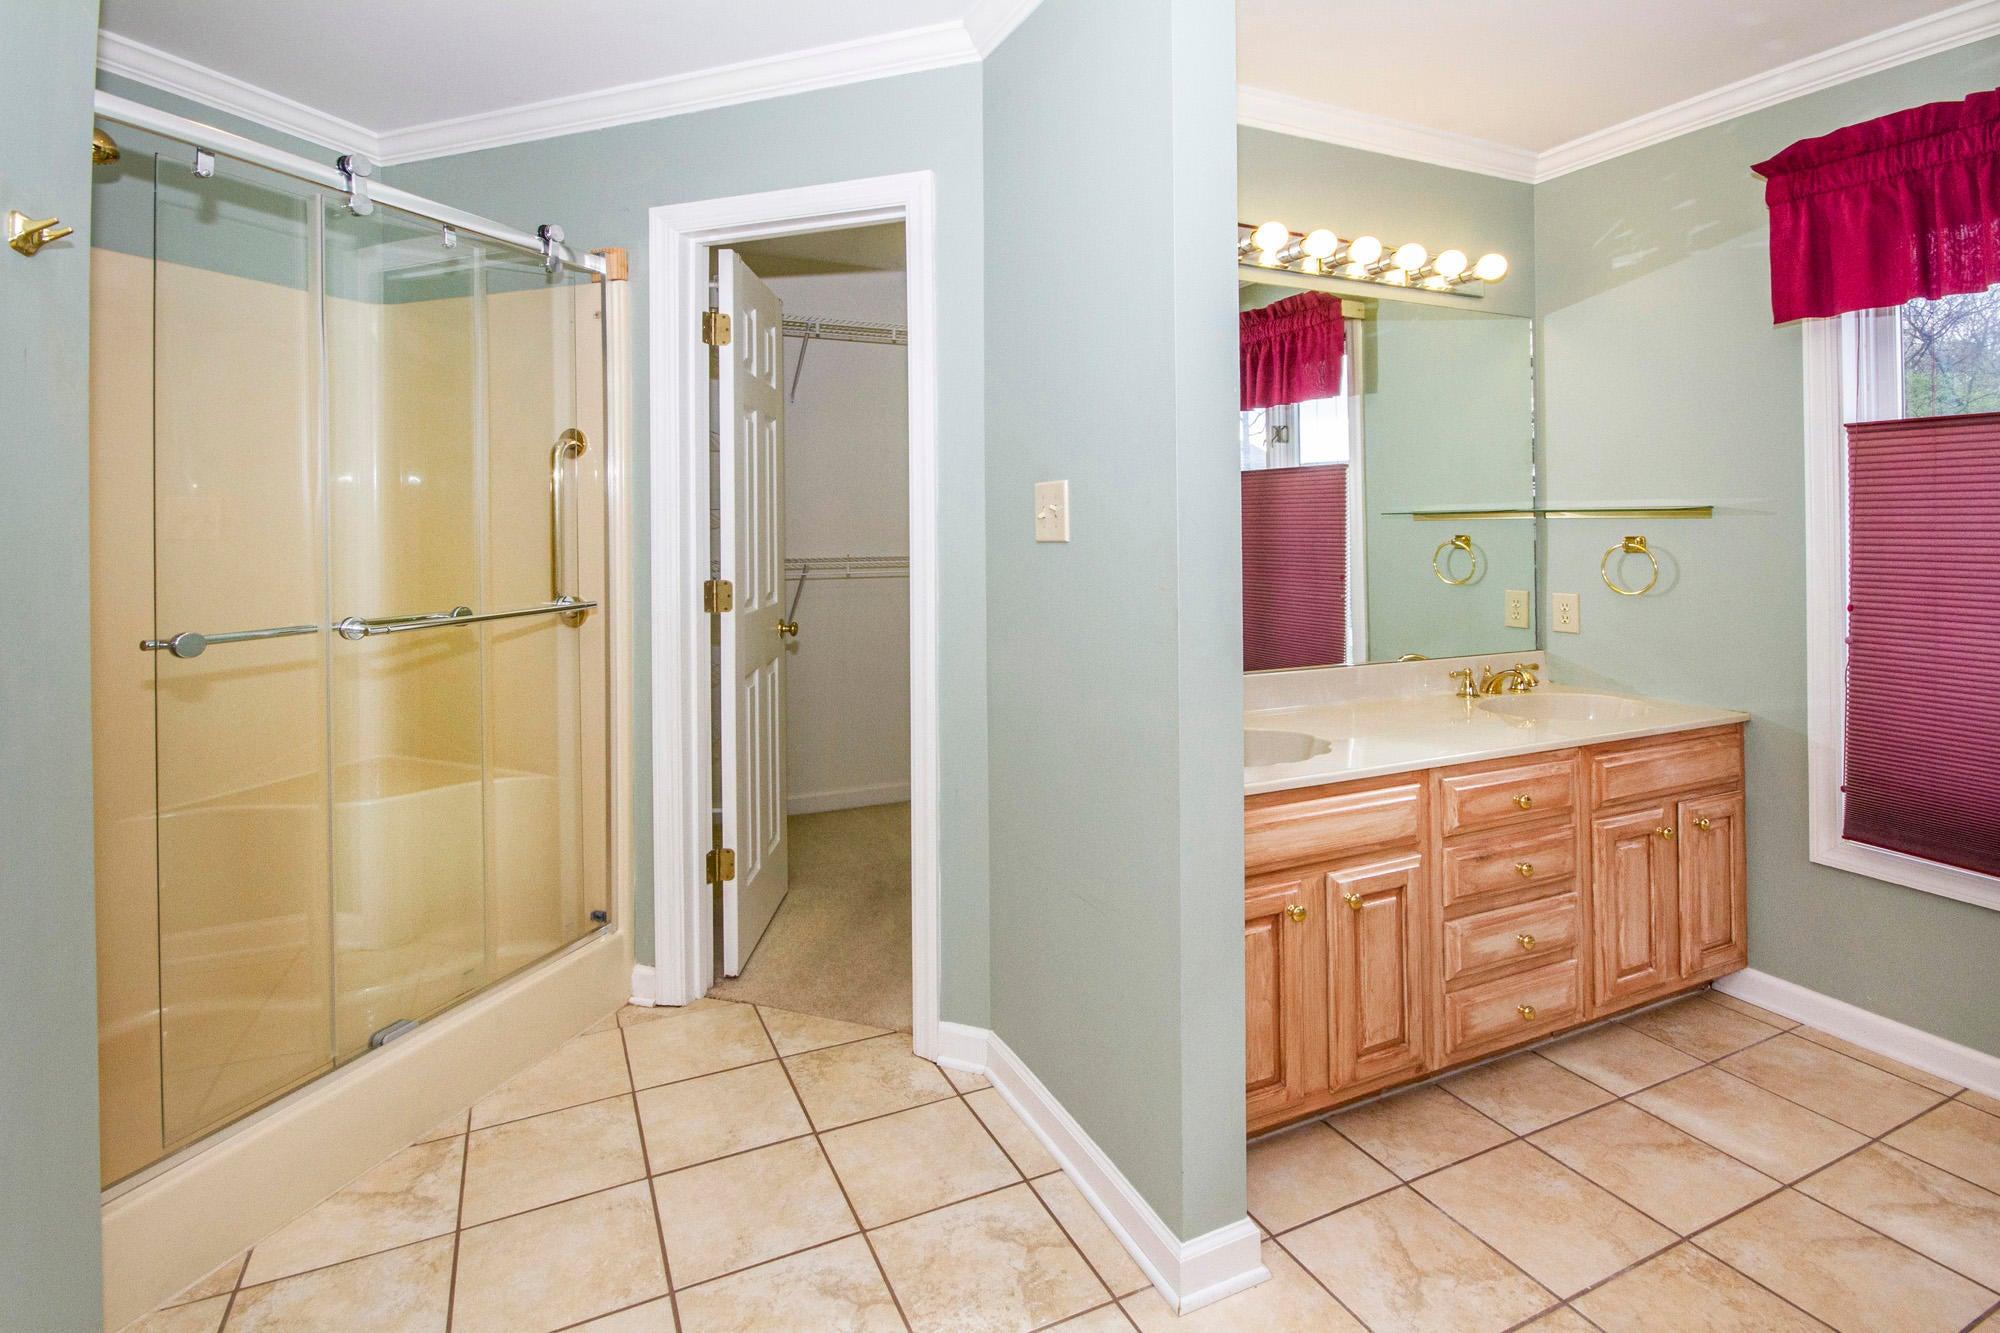 Walk-in Shower & Whirlpool Tub